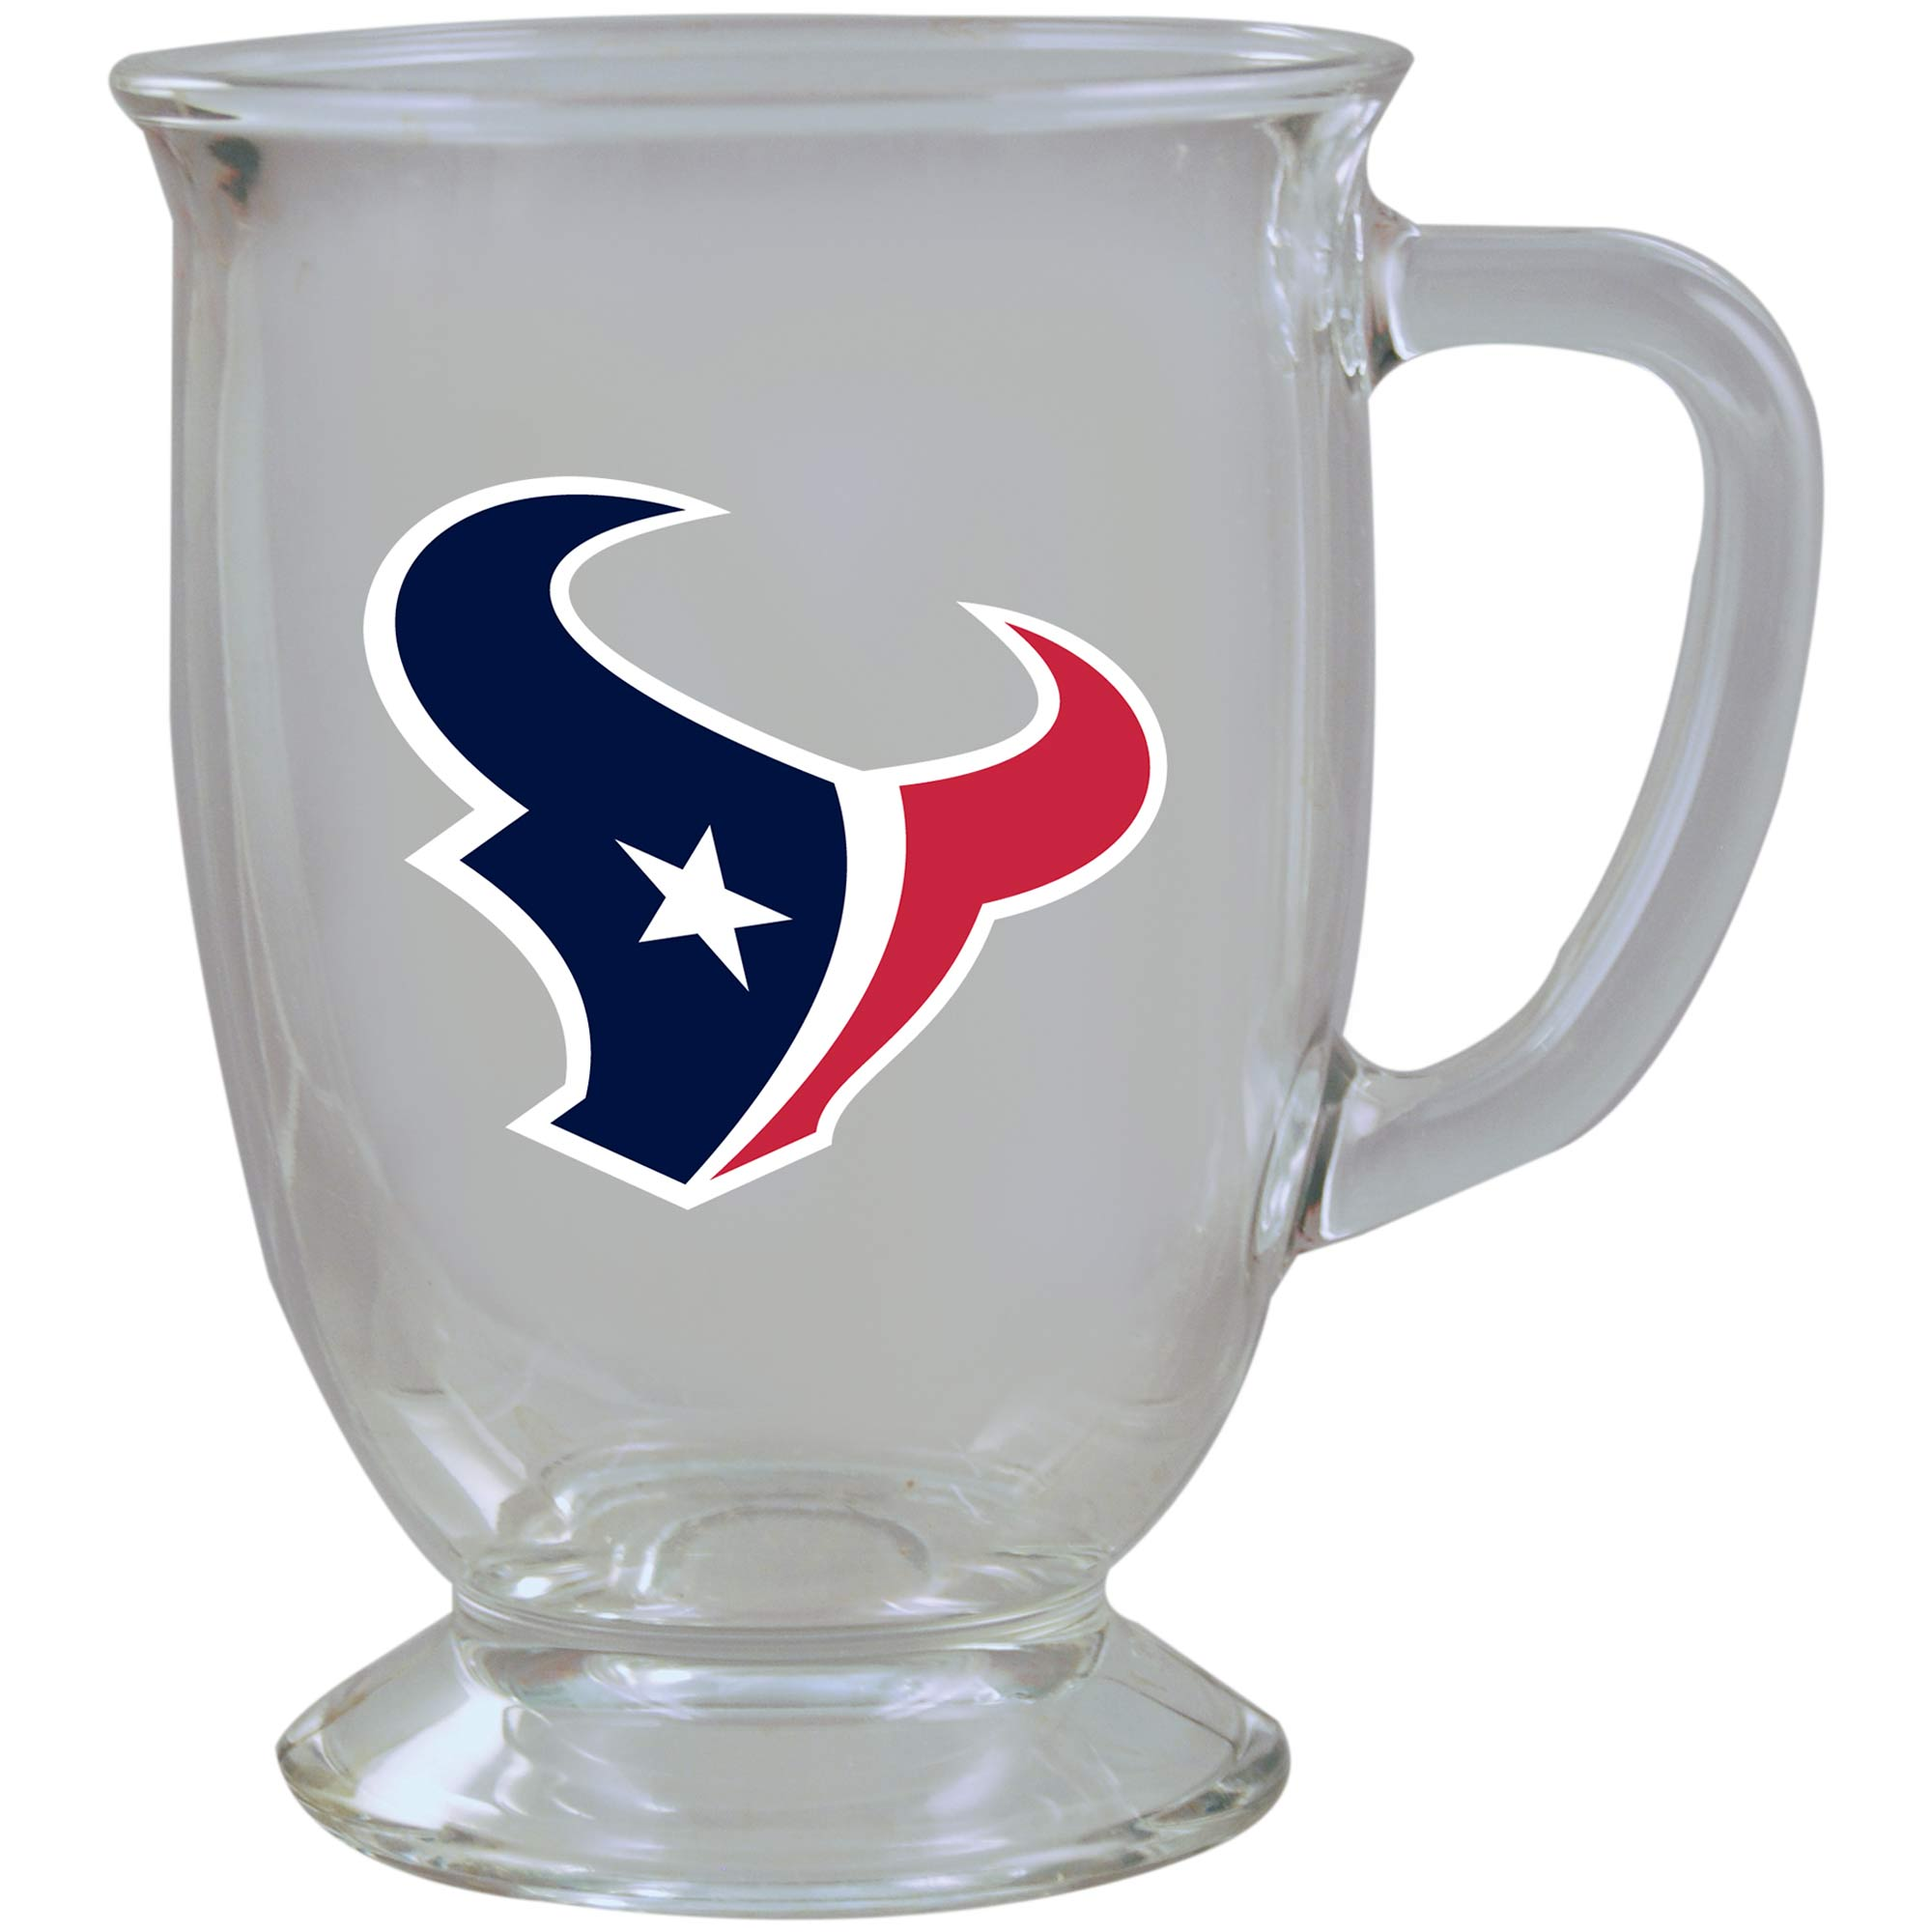 Houston Texans 16oz. Kona Glass Mug - No Size